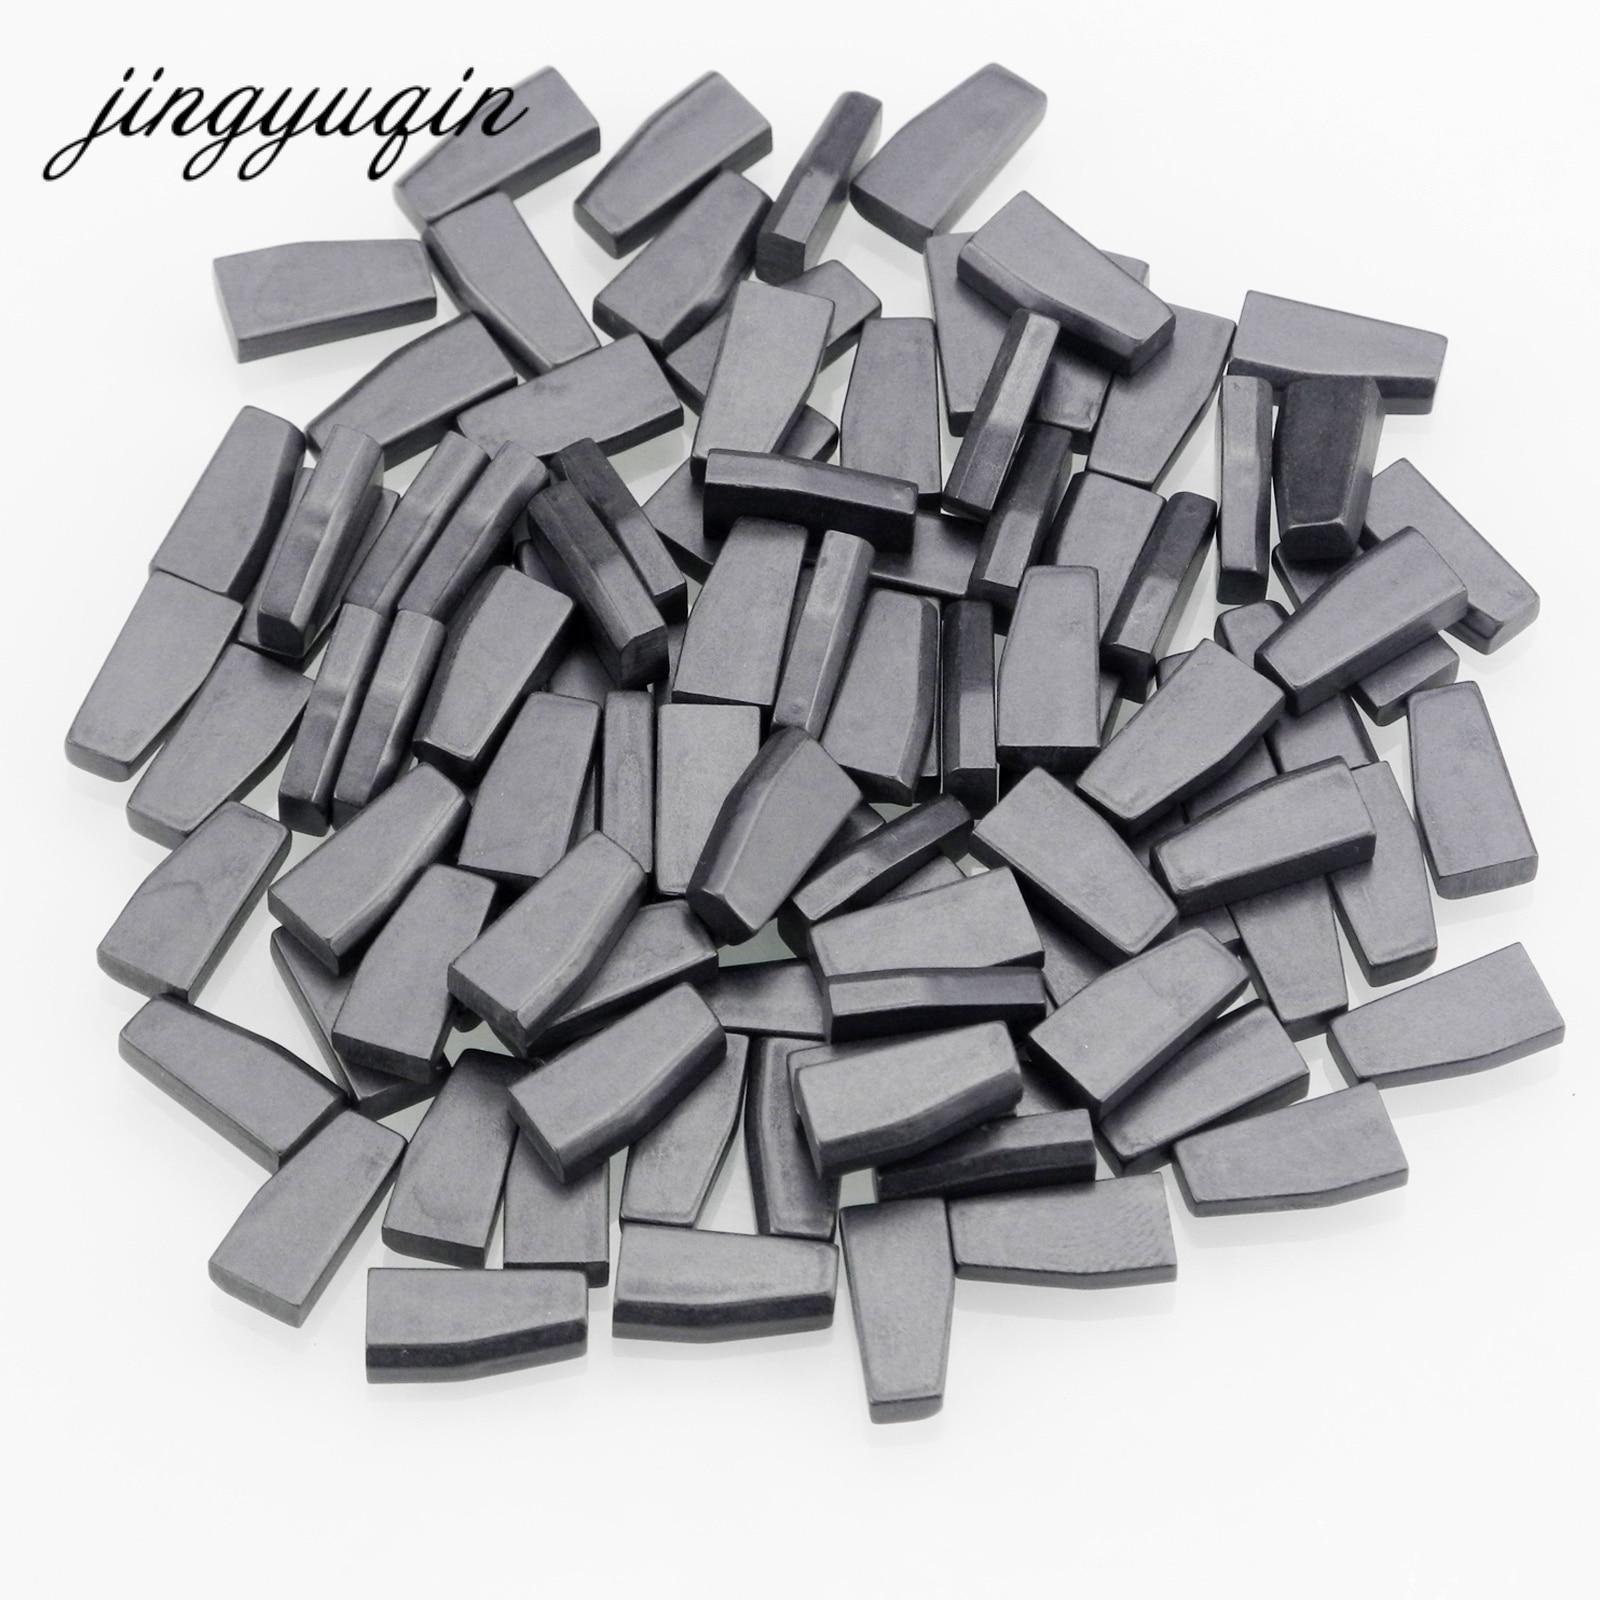 Jingyuqin 10pcs/lot Car Key Chip ID44 ID46 ID60 Transponder Chip Carbon PCF7935AA PCF7936/PCF7936AS